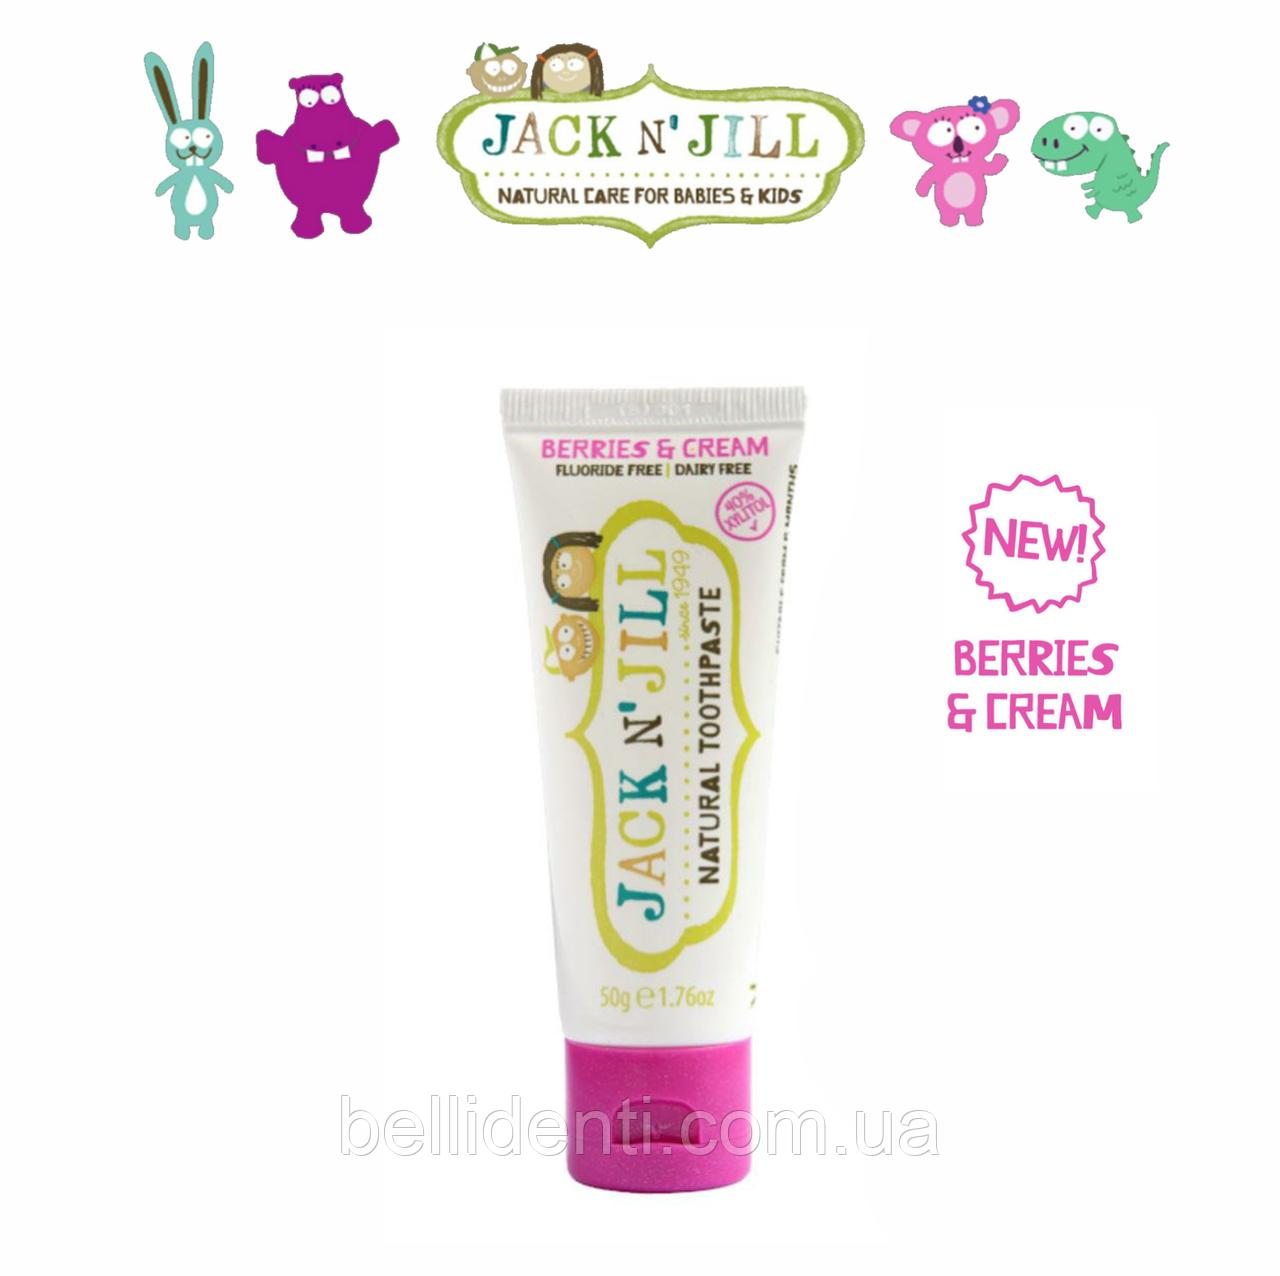 Натуральная зубная паста Jack N' Jill (с ягодно-сливочным вкусом) (50g)